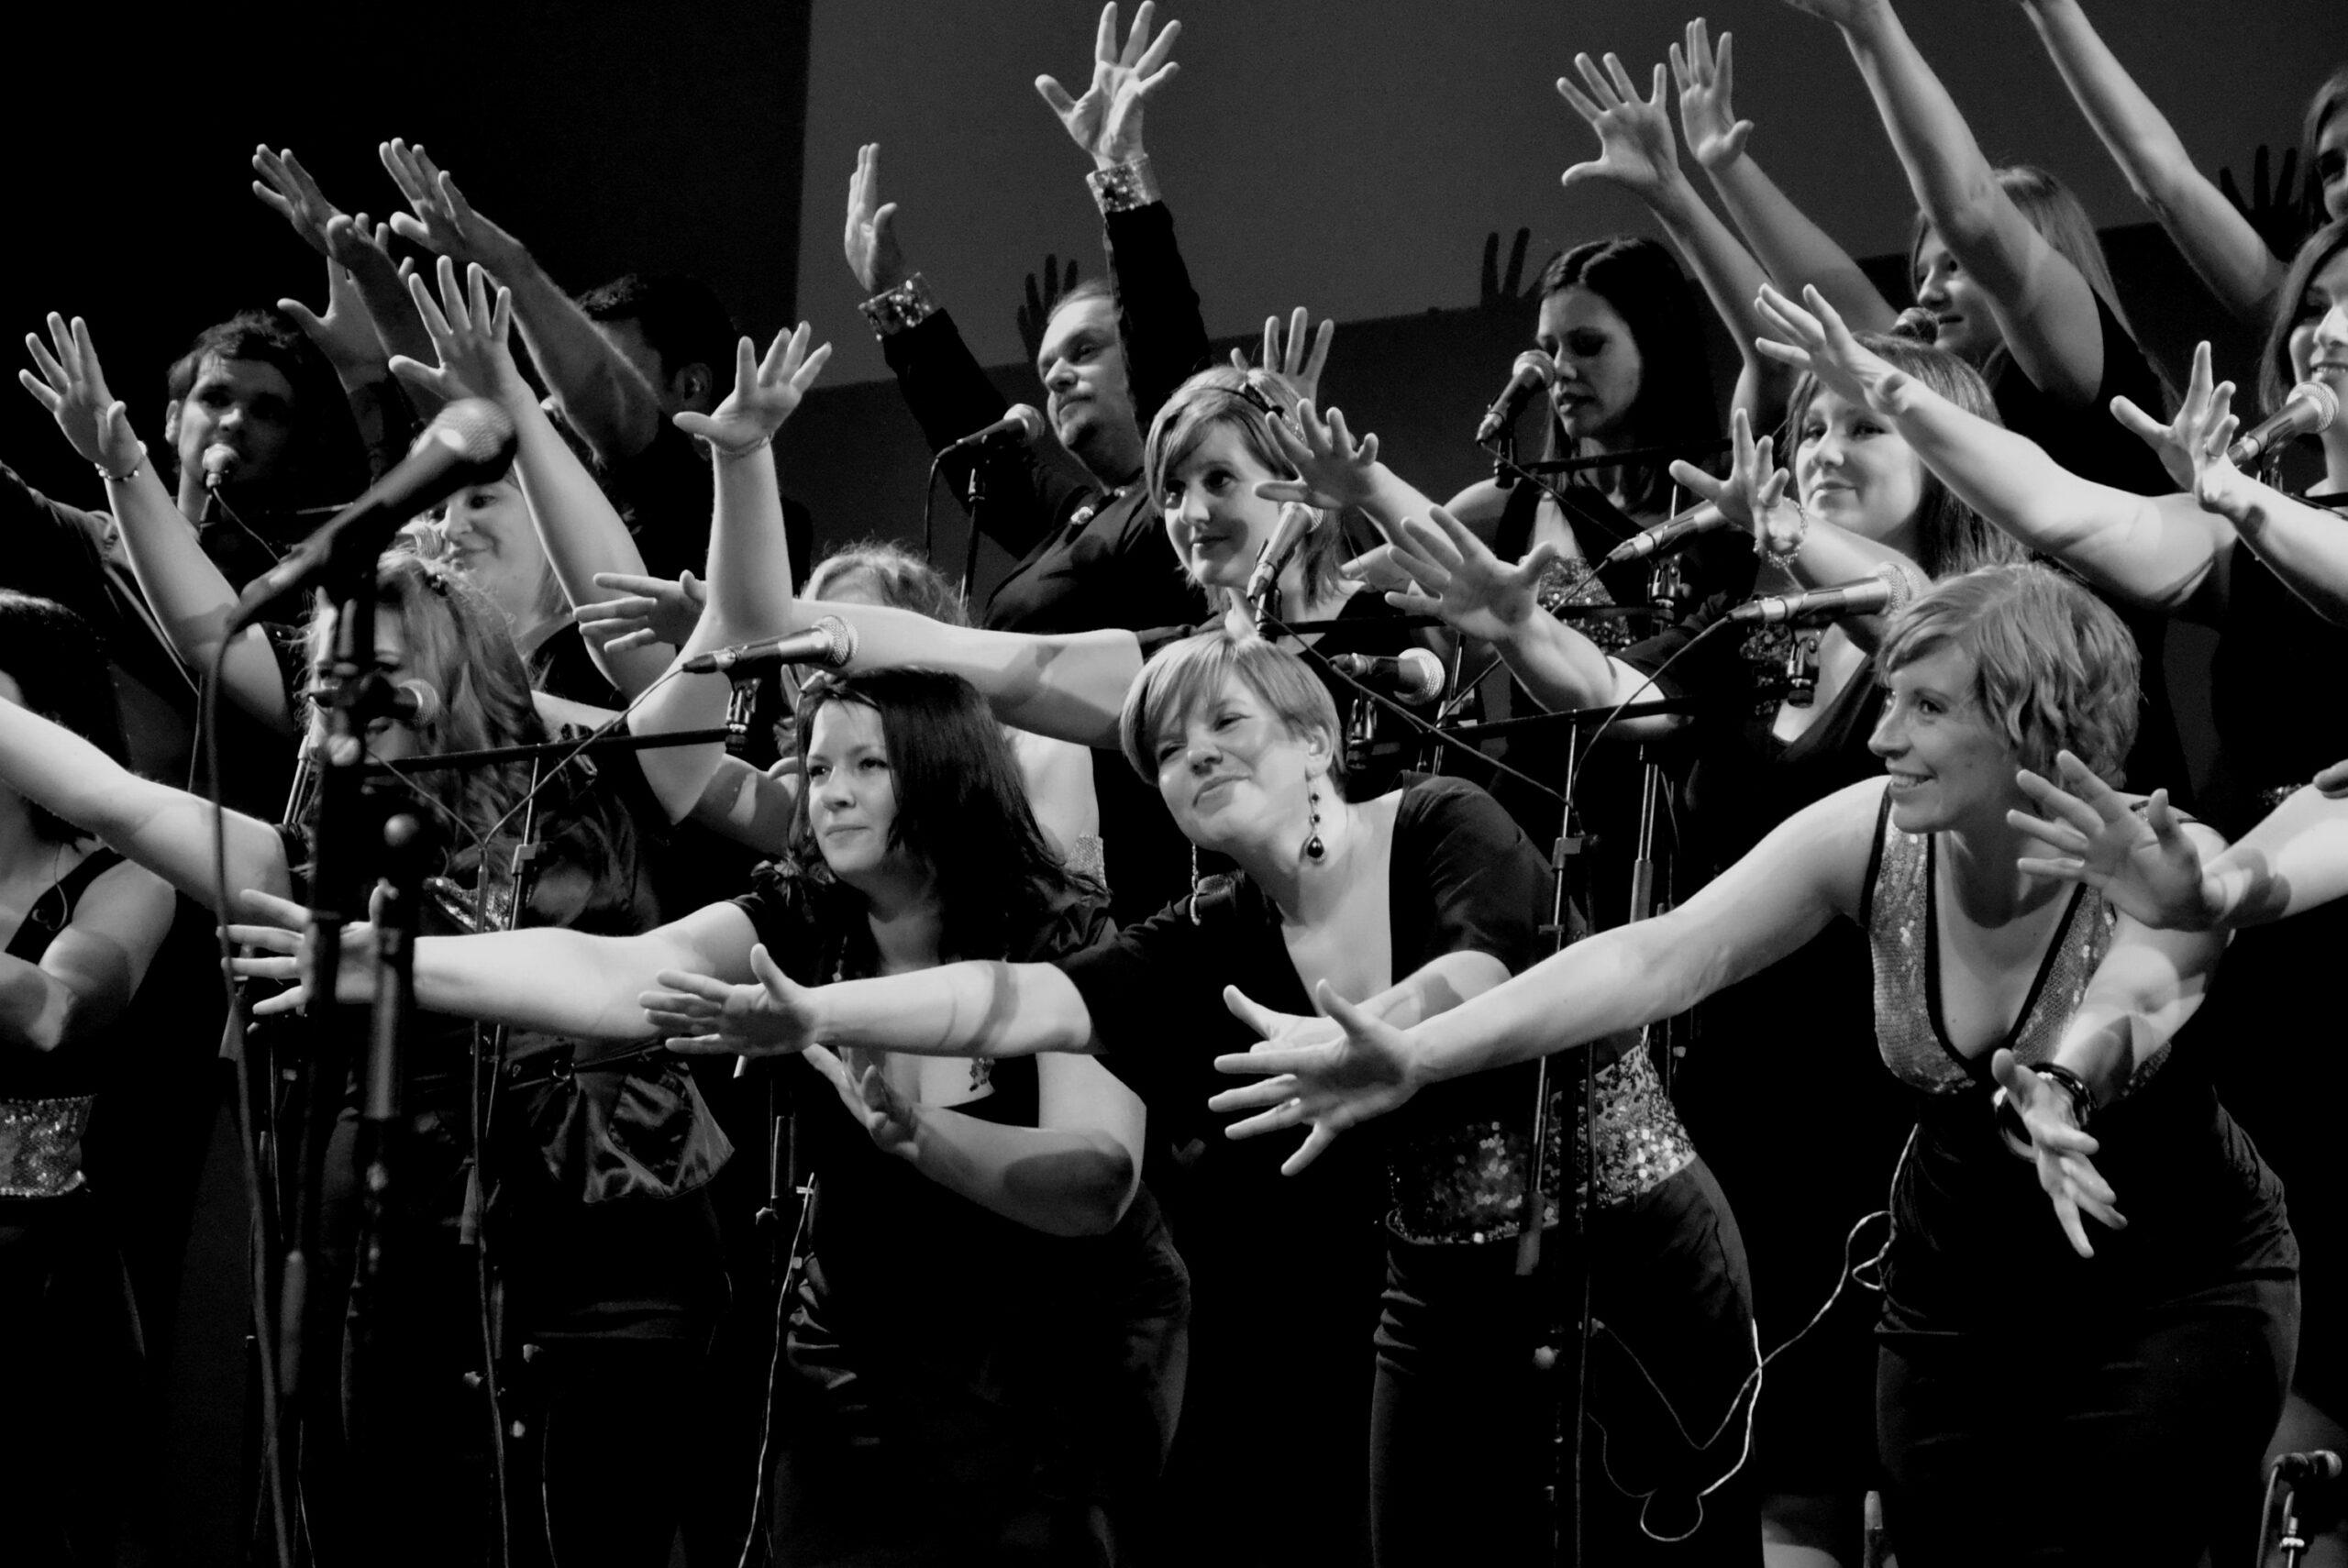 Janja Cizelj, Slovenija/Slovenia: Perpetum jazzile, 2014, Slovenija